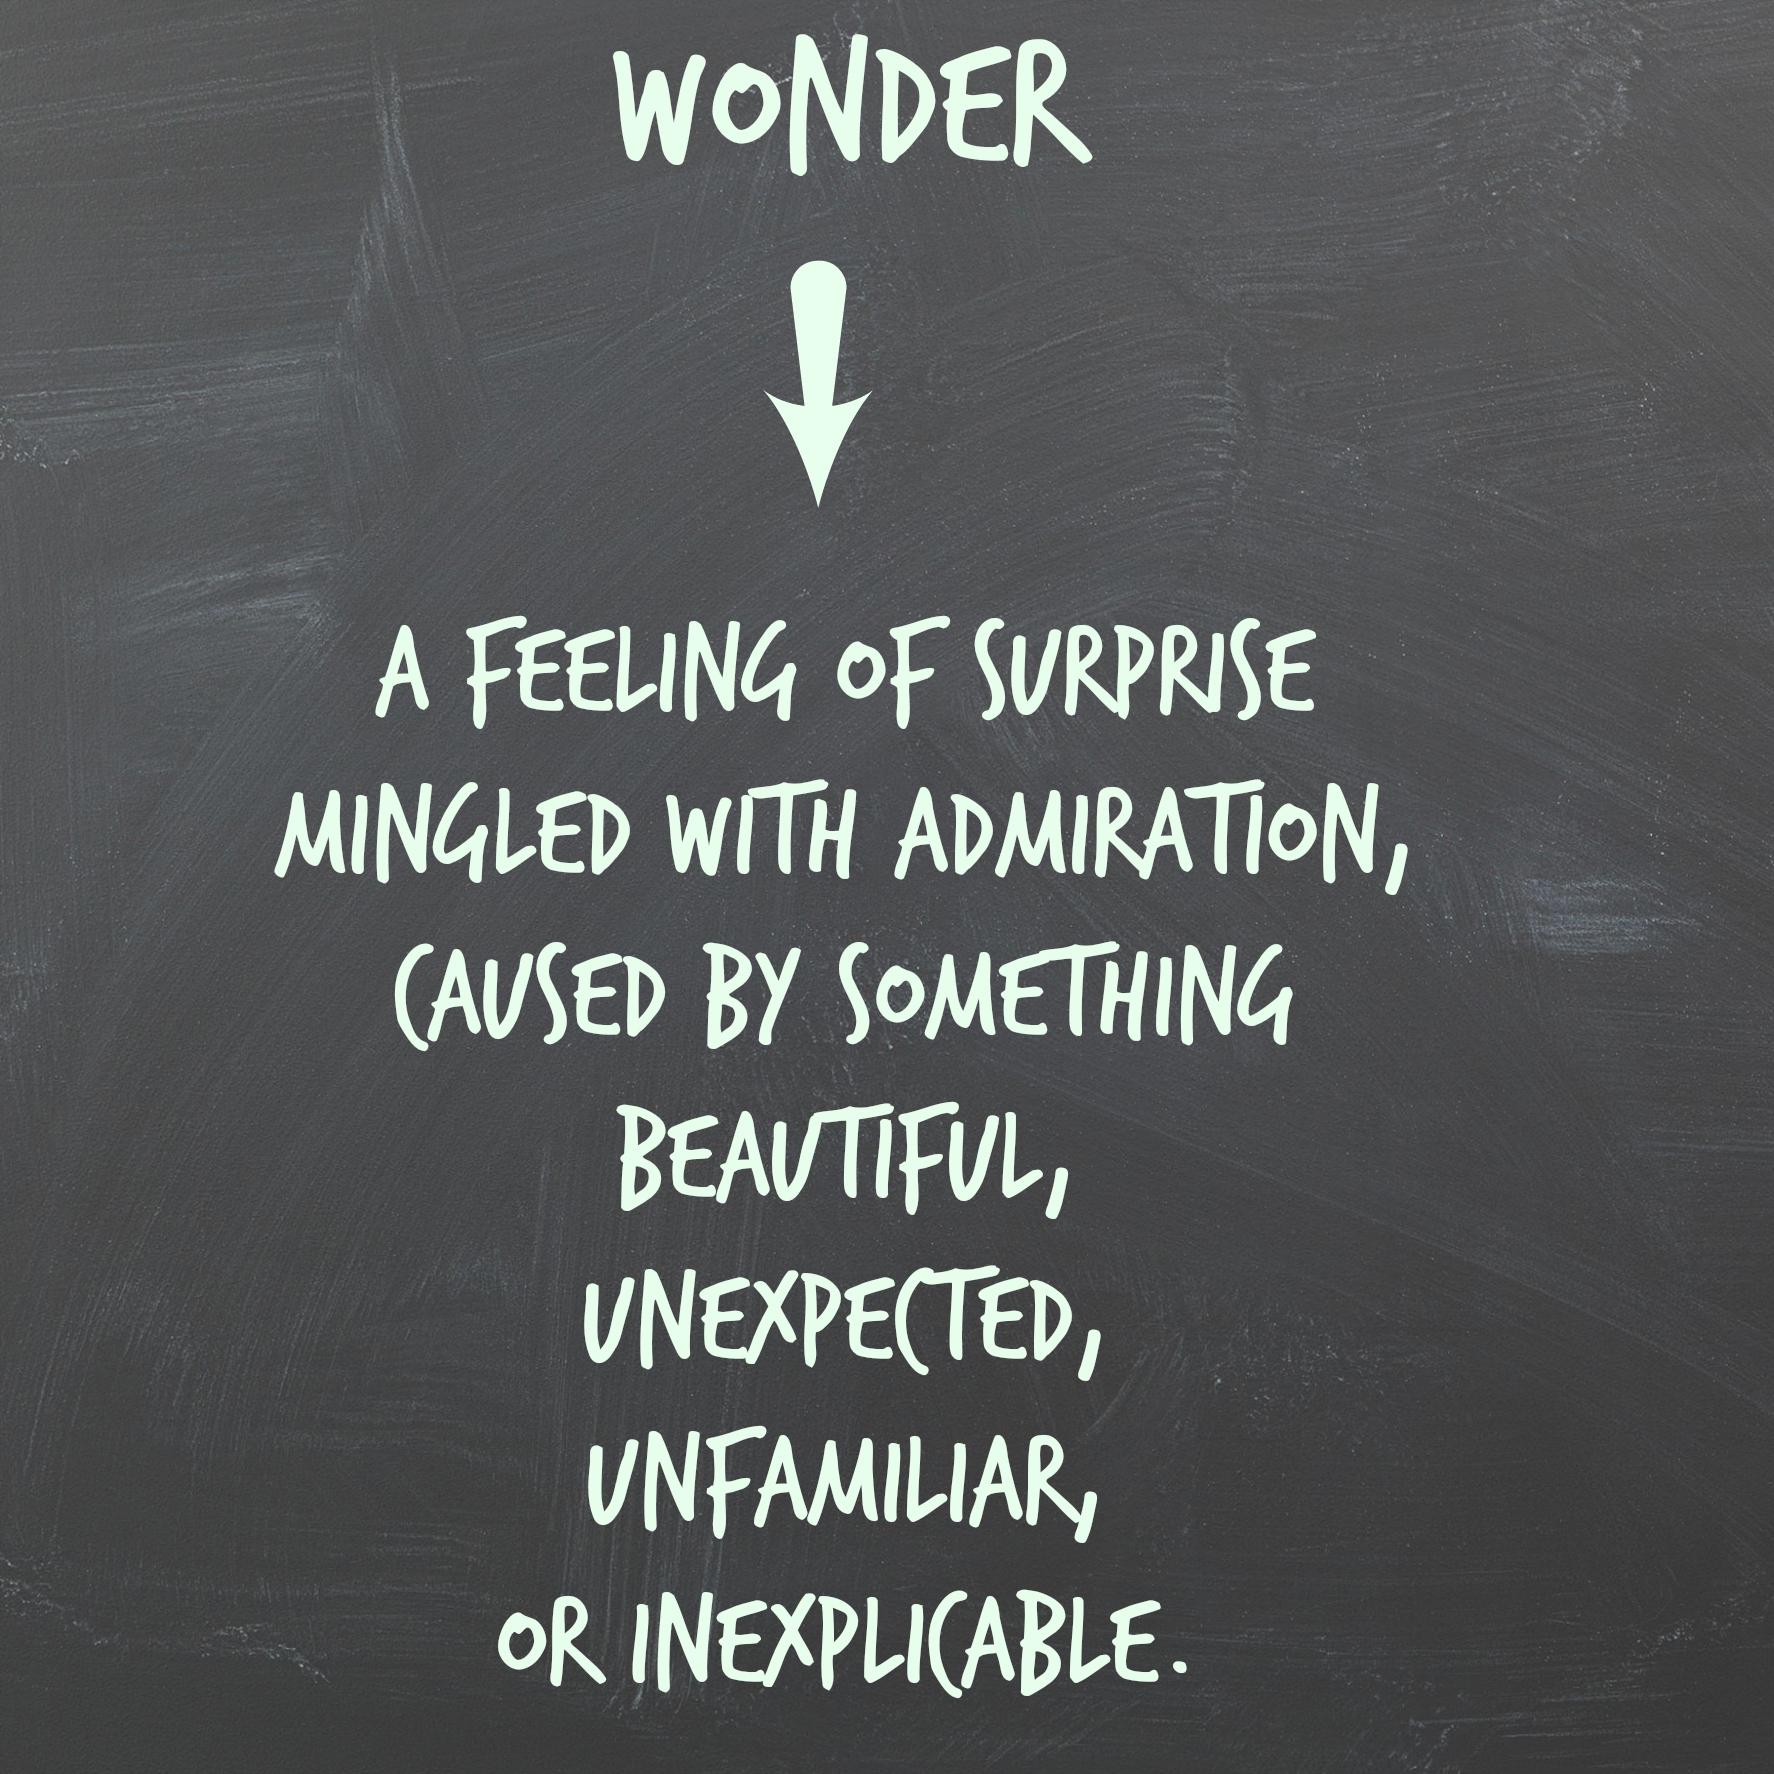 5 ways to awaken your sense of wonder today